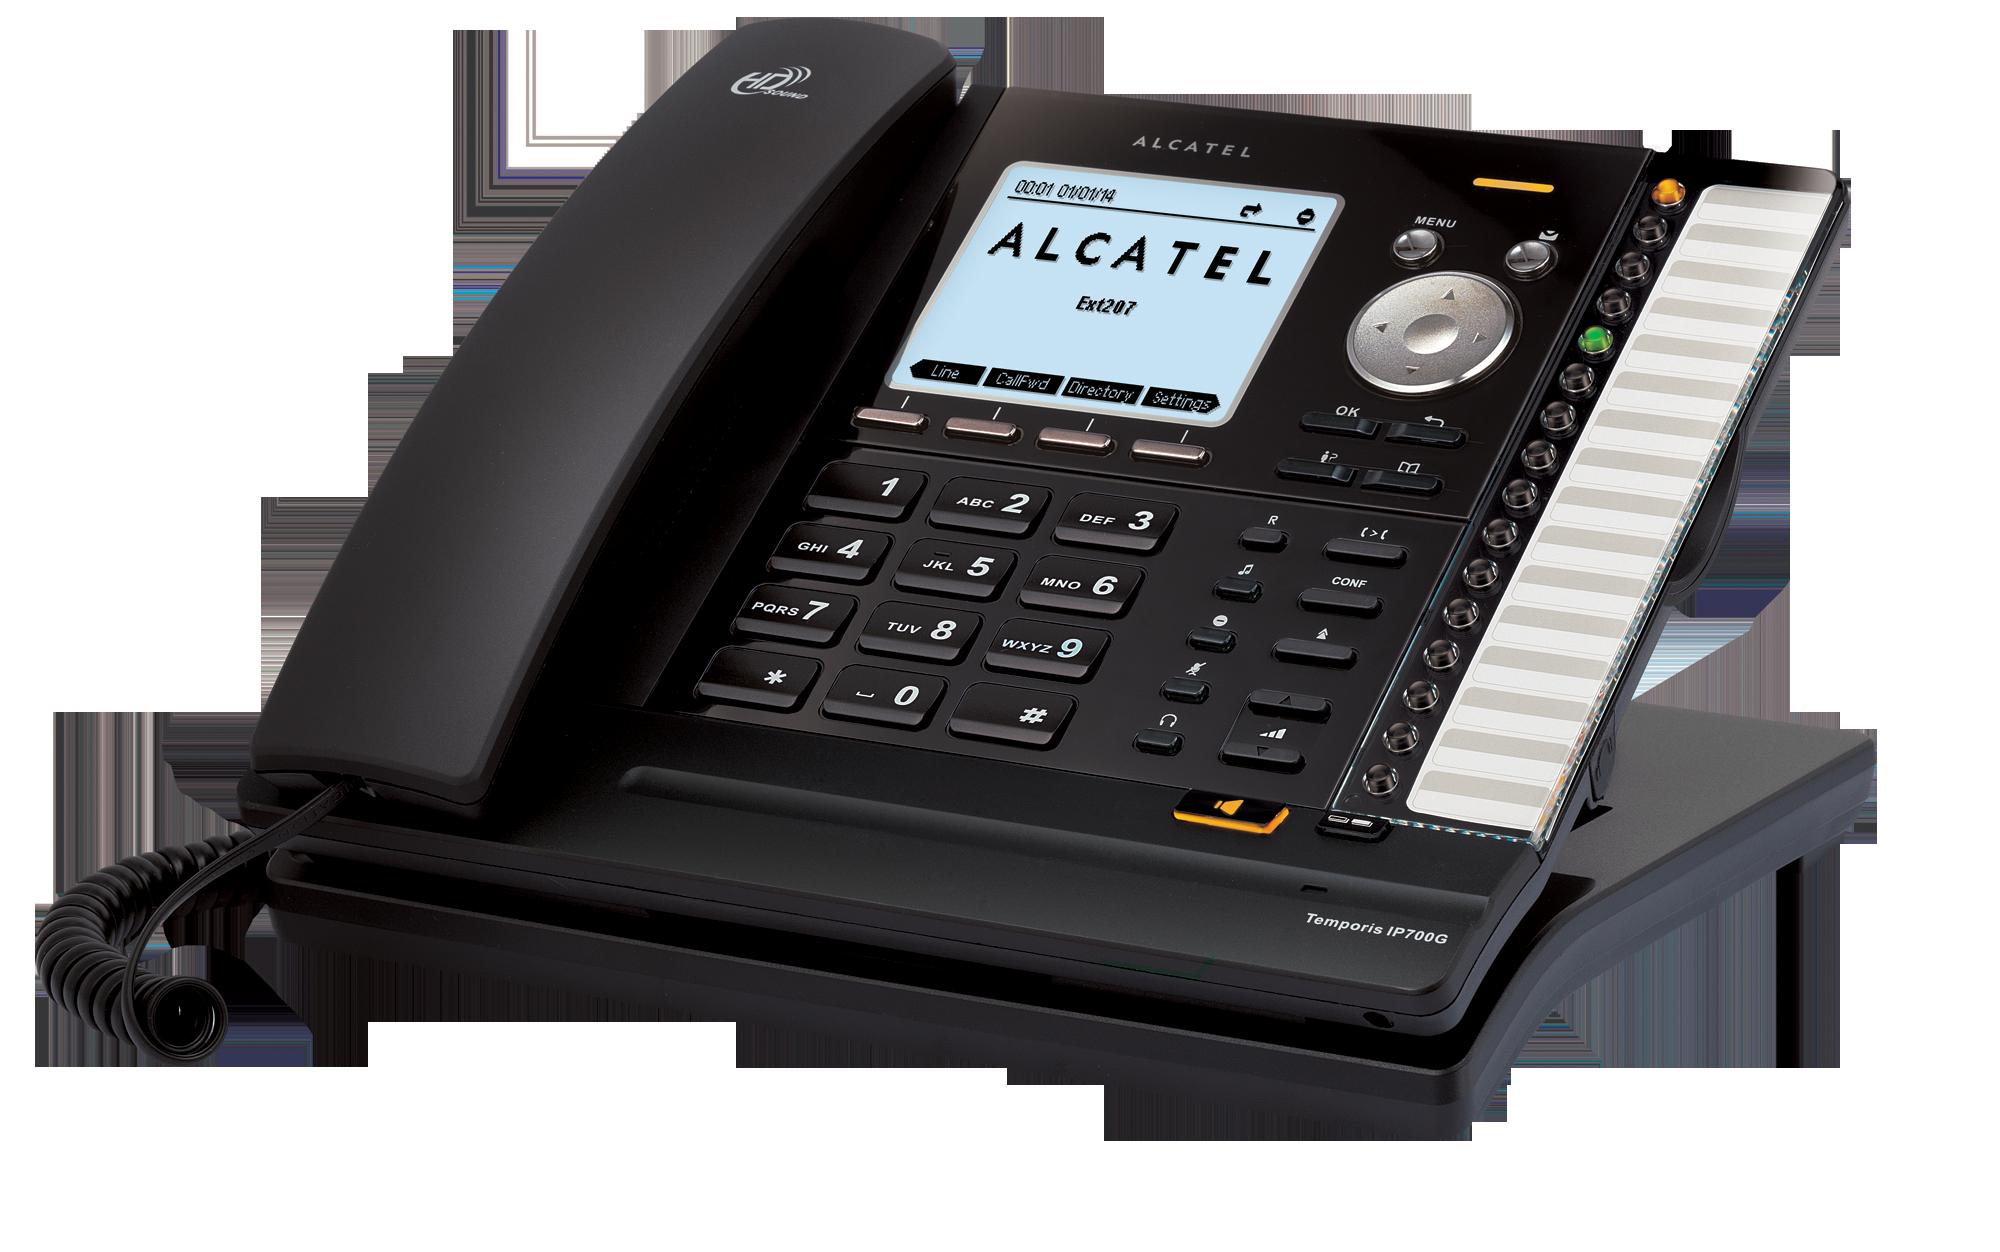 Clipart phone corded phone. Alcatel temporis ip g